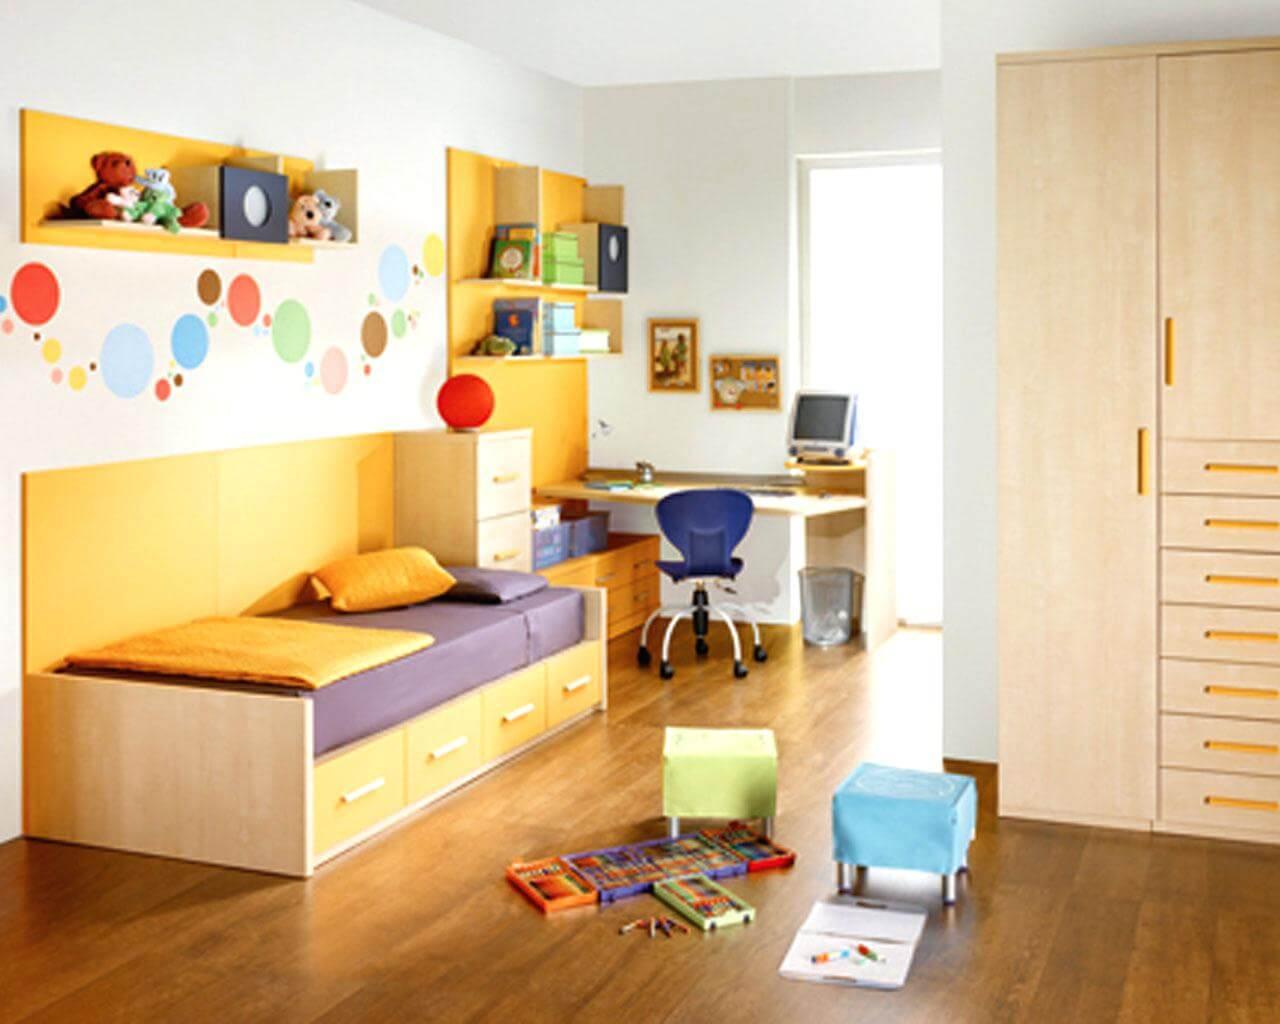 children-s-bedroom-furniture-for-cool-kids-room-design-study-photo- (1)